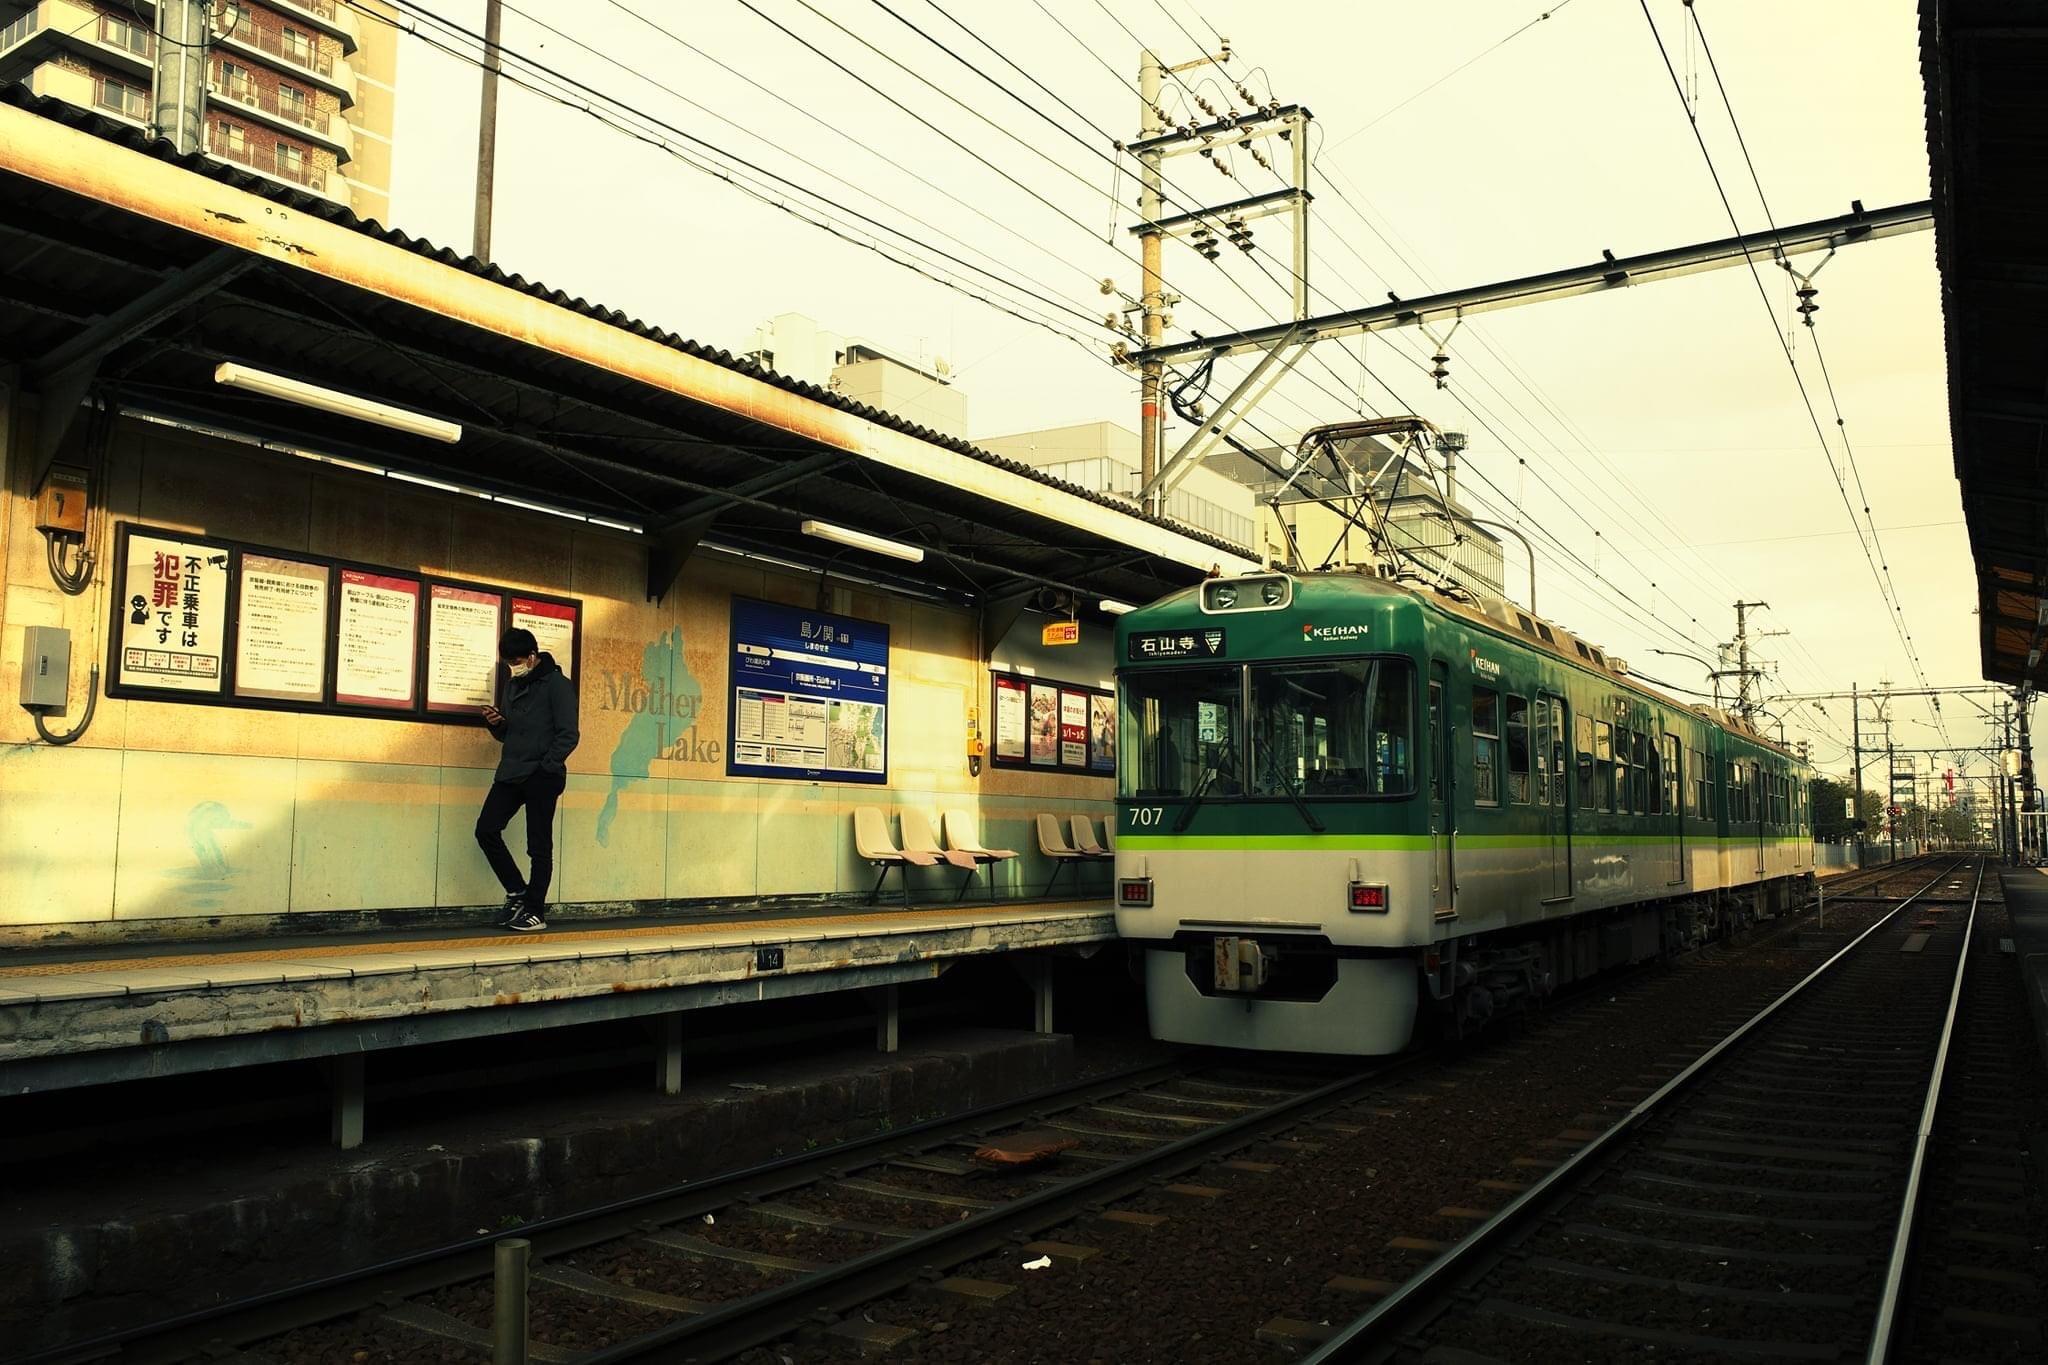 f:id:oitanshi:20210228210839j:plain